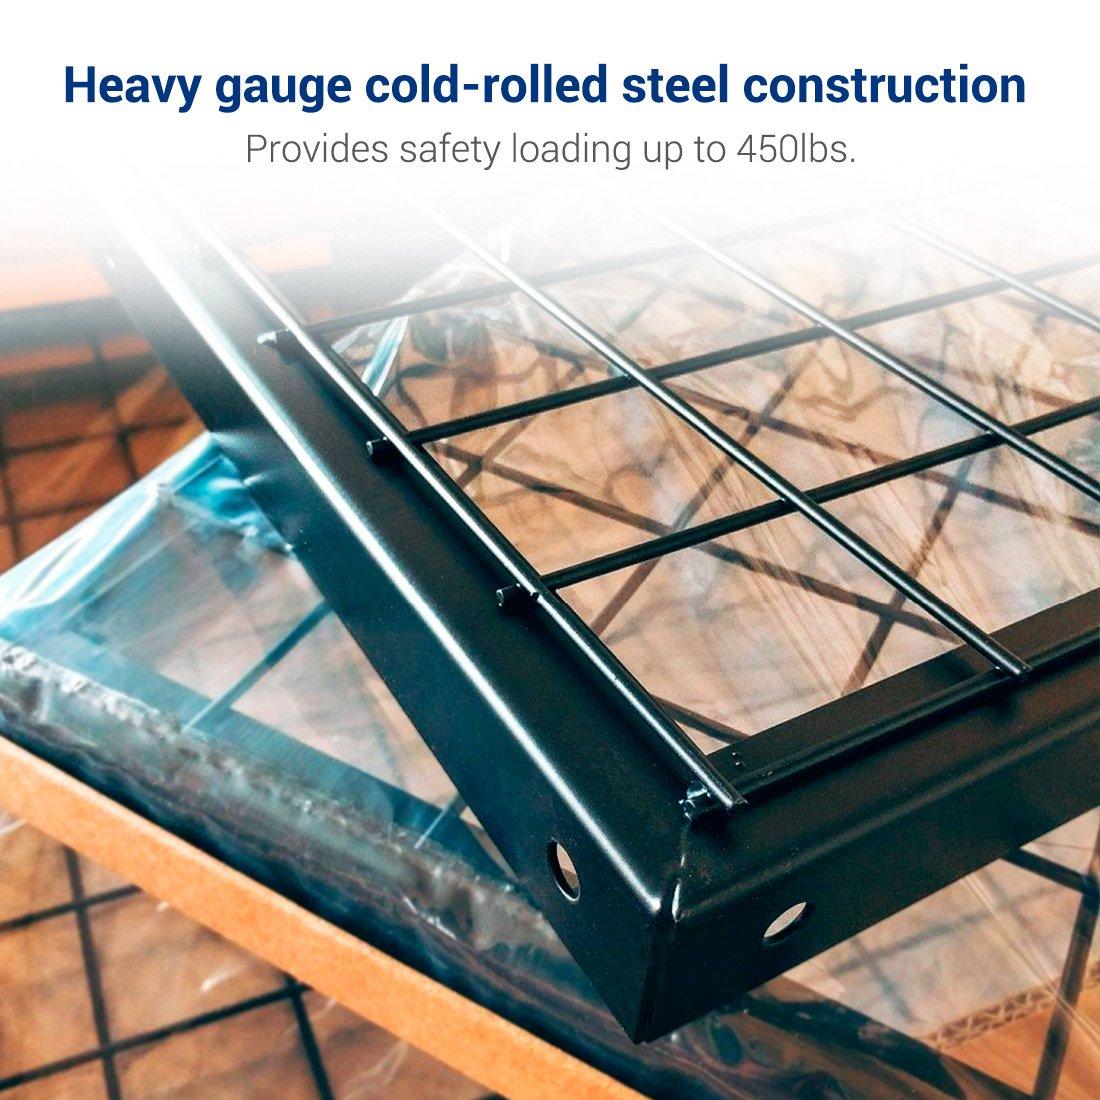 FLEXIMOUNTS 4x6 Heavy Duty Overhead Garage Adjustable Ceiling Storage Rack, 72'' Length x 48'' Width x 40'' Height, Black by FLEXIMOUNTS (Image #3)